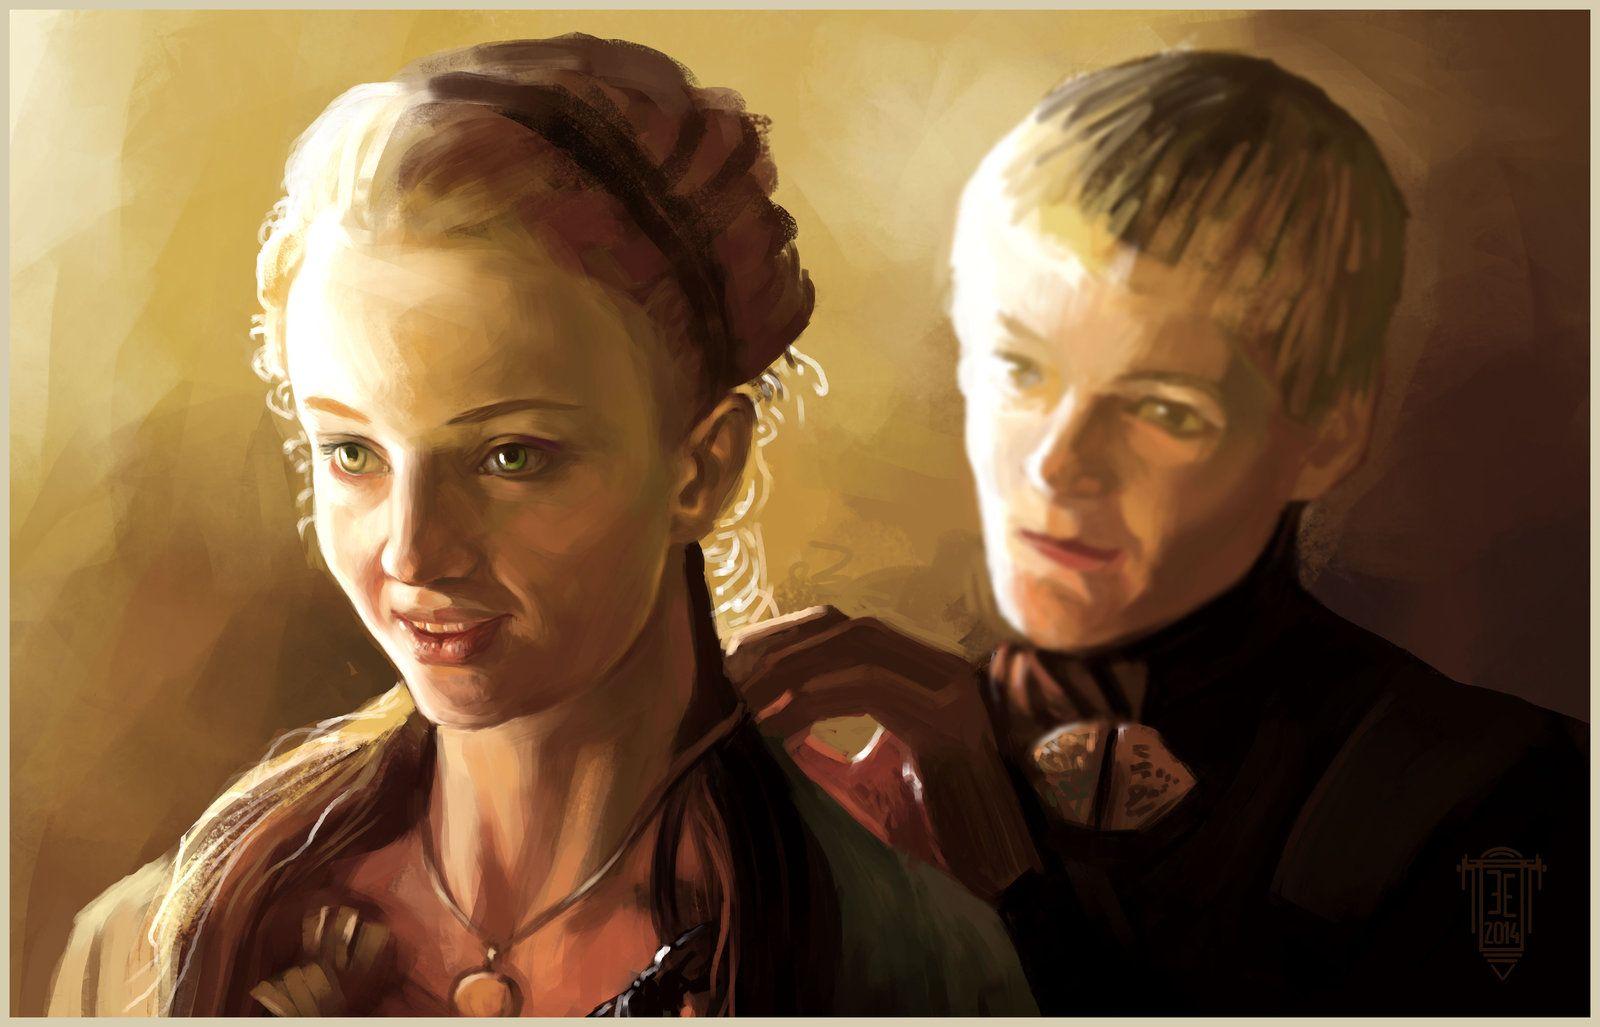 joffrey baratheon & Sansa Stark  Fanart GoT